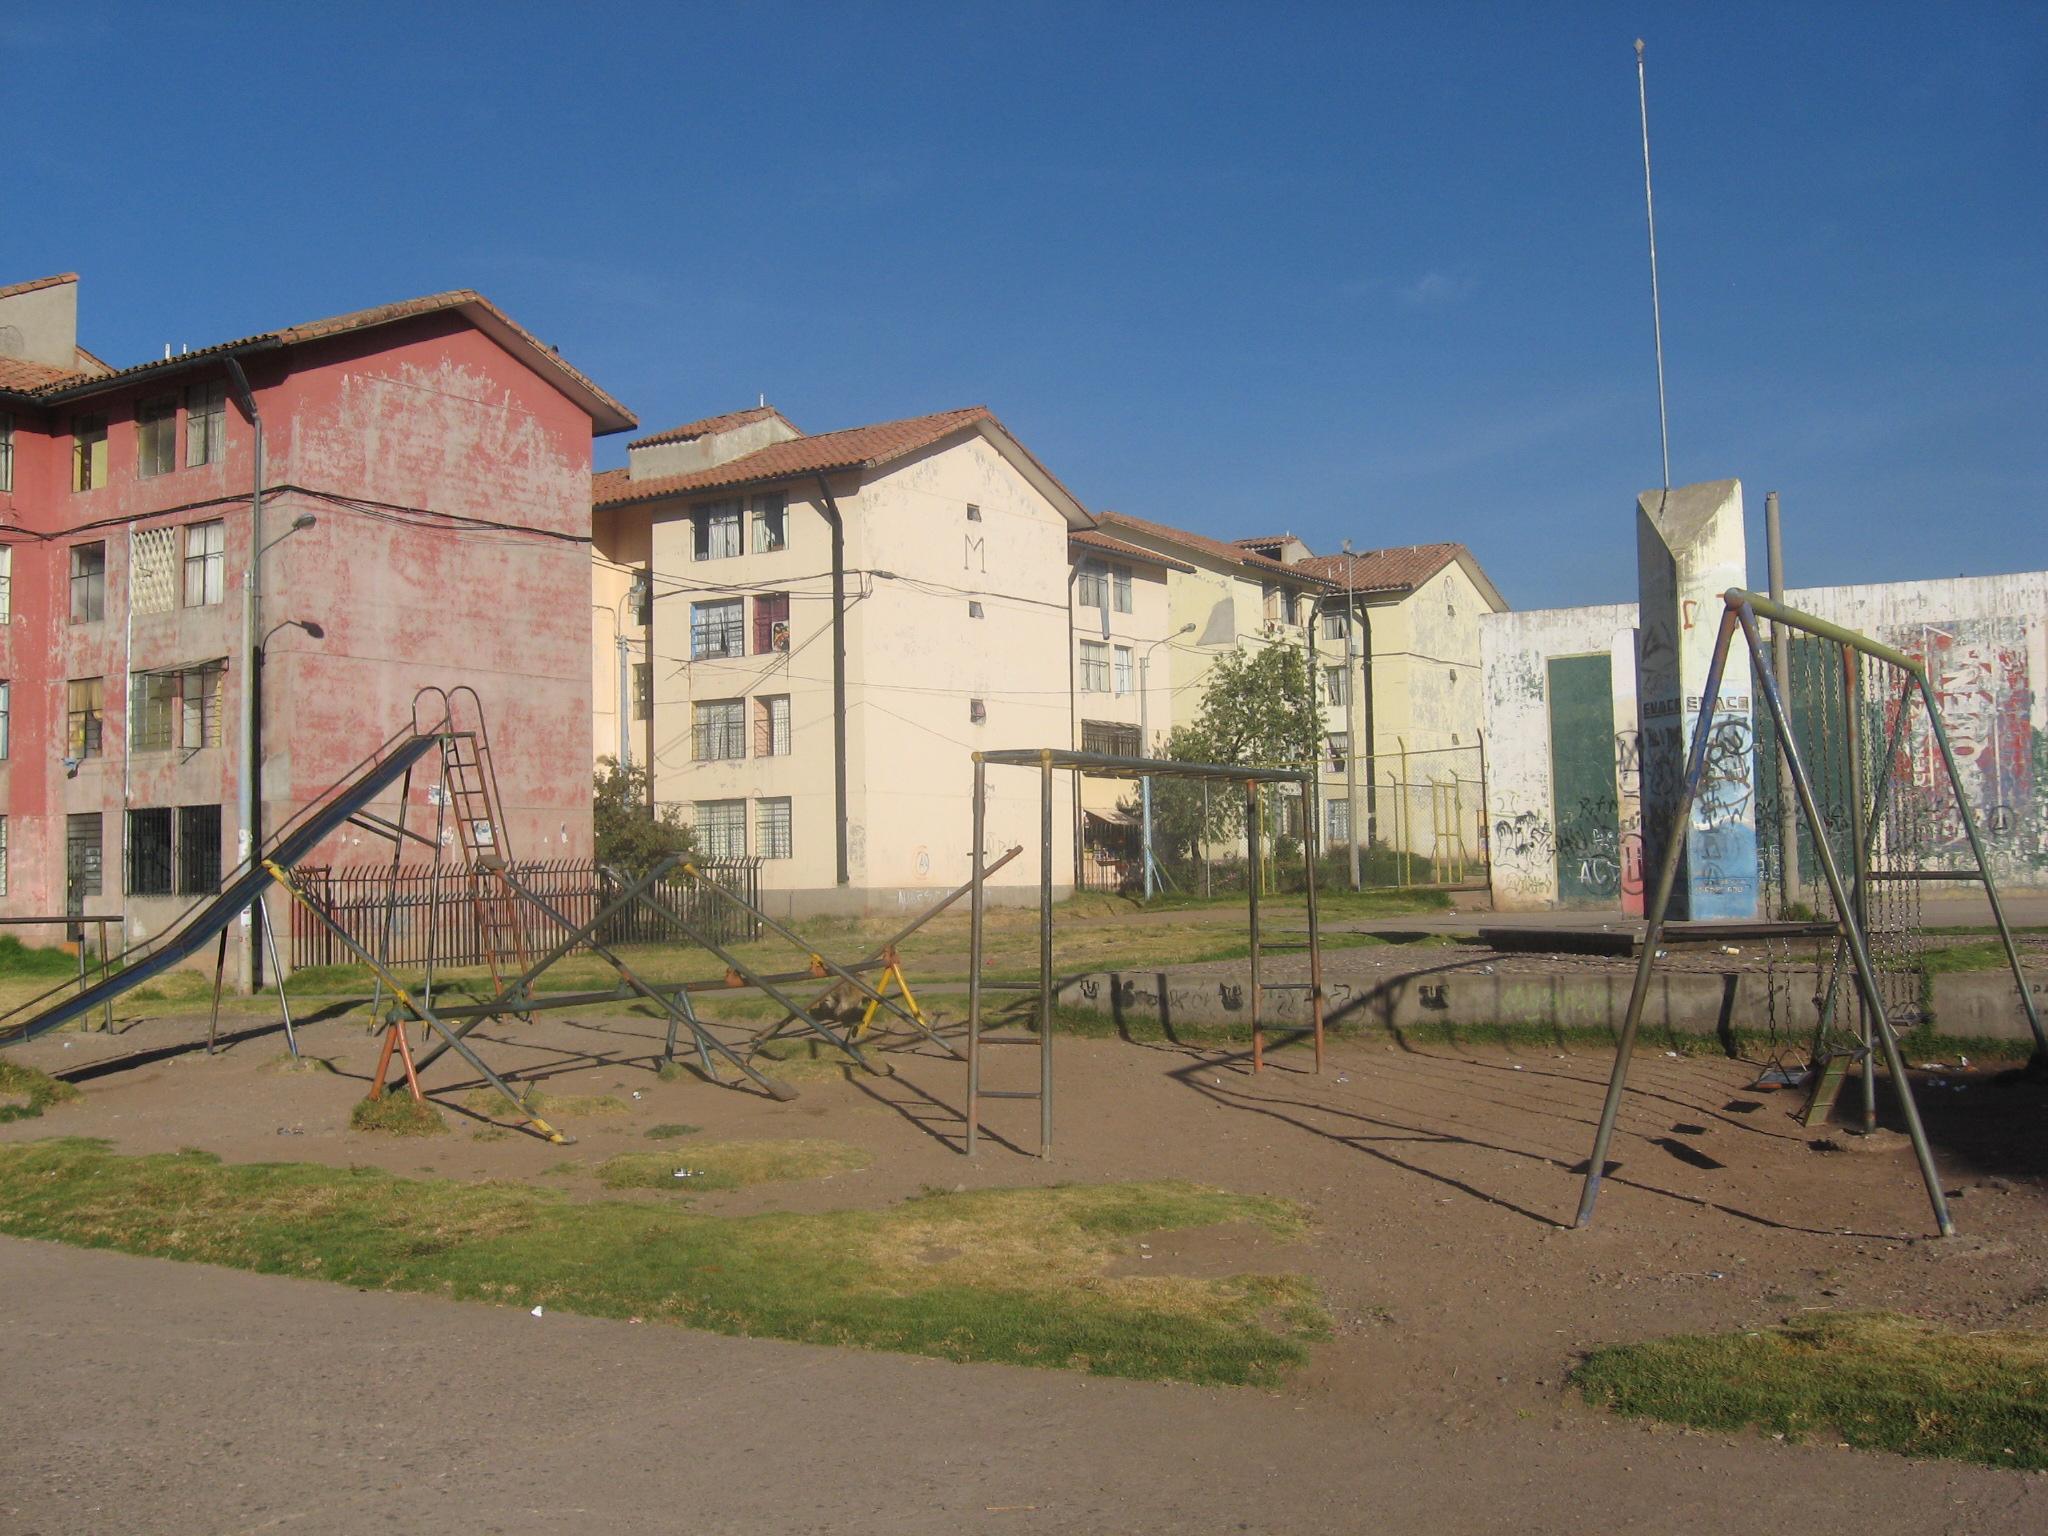 Our neighborhood in Cusco, Peru